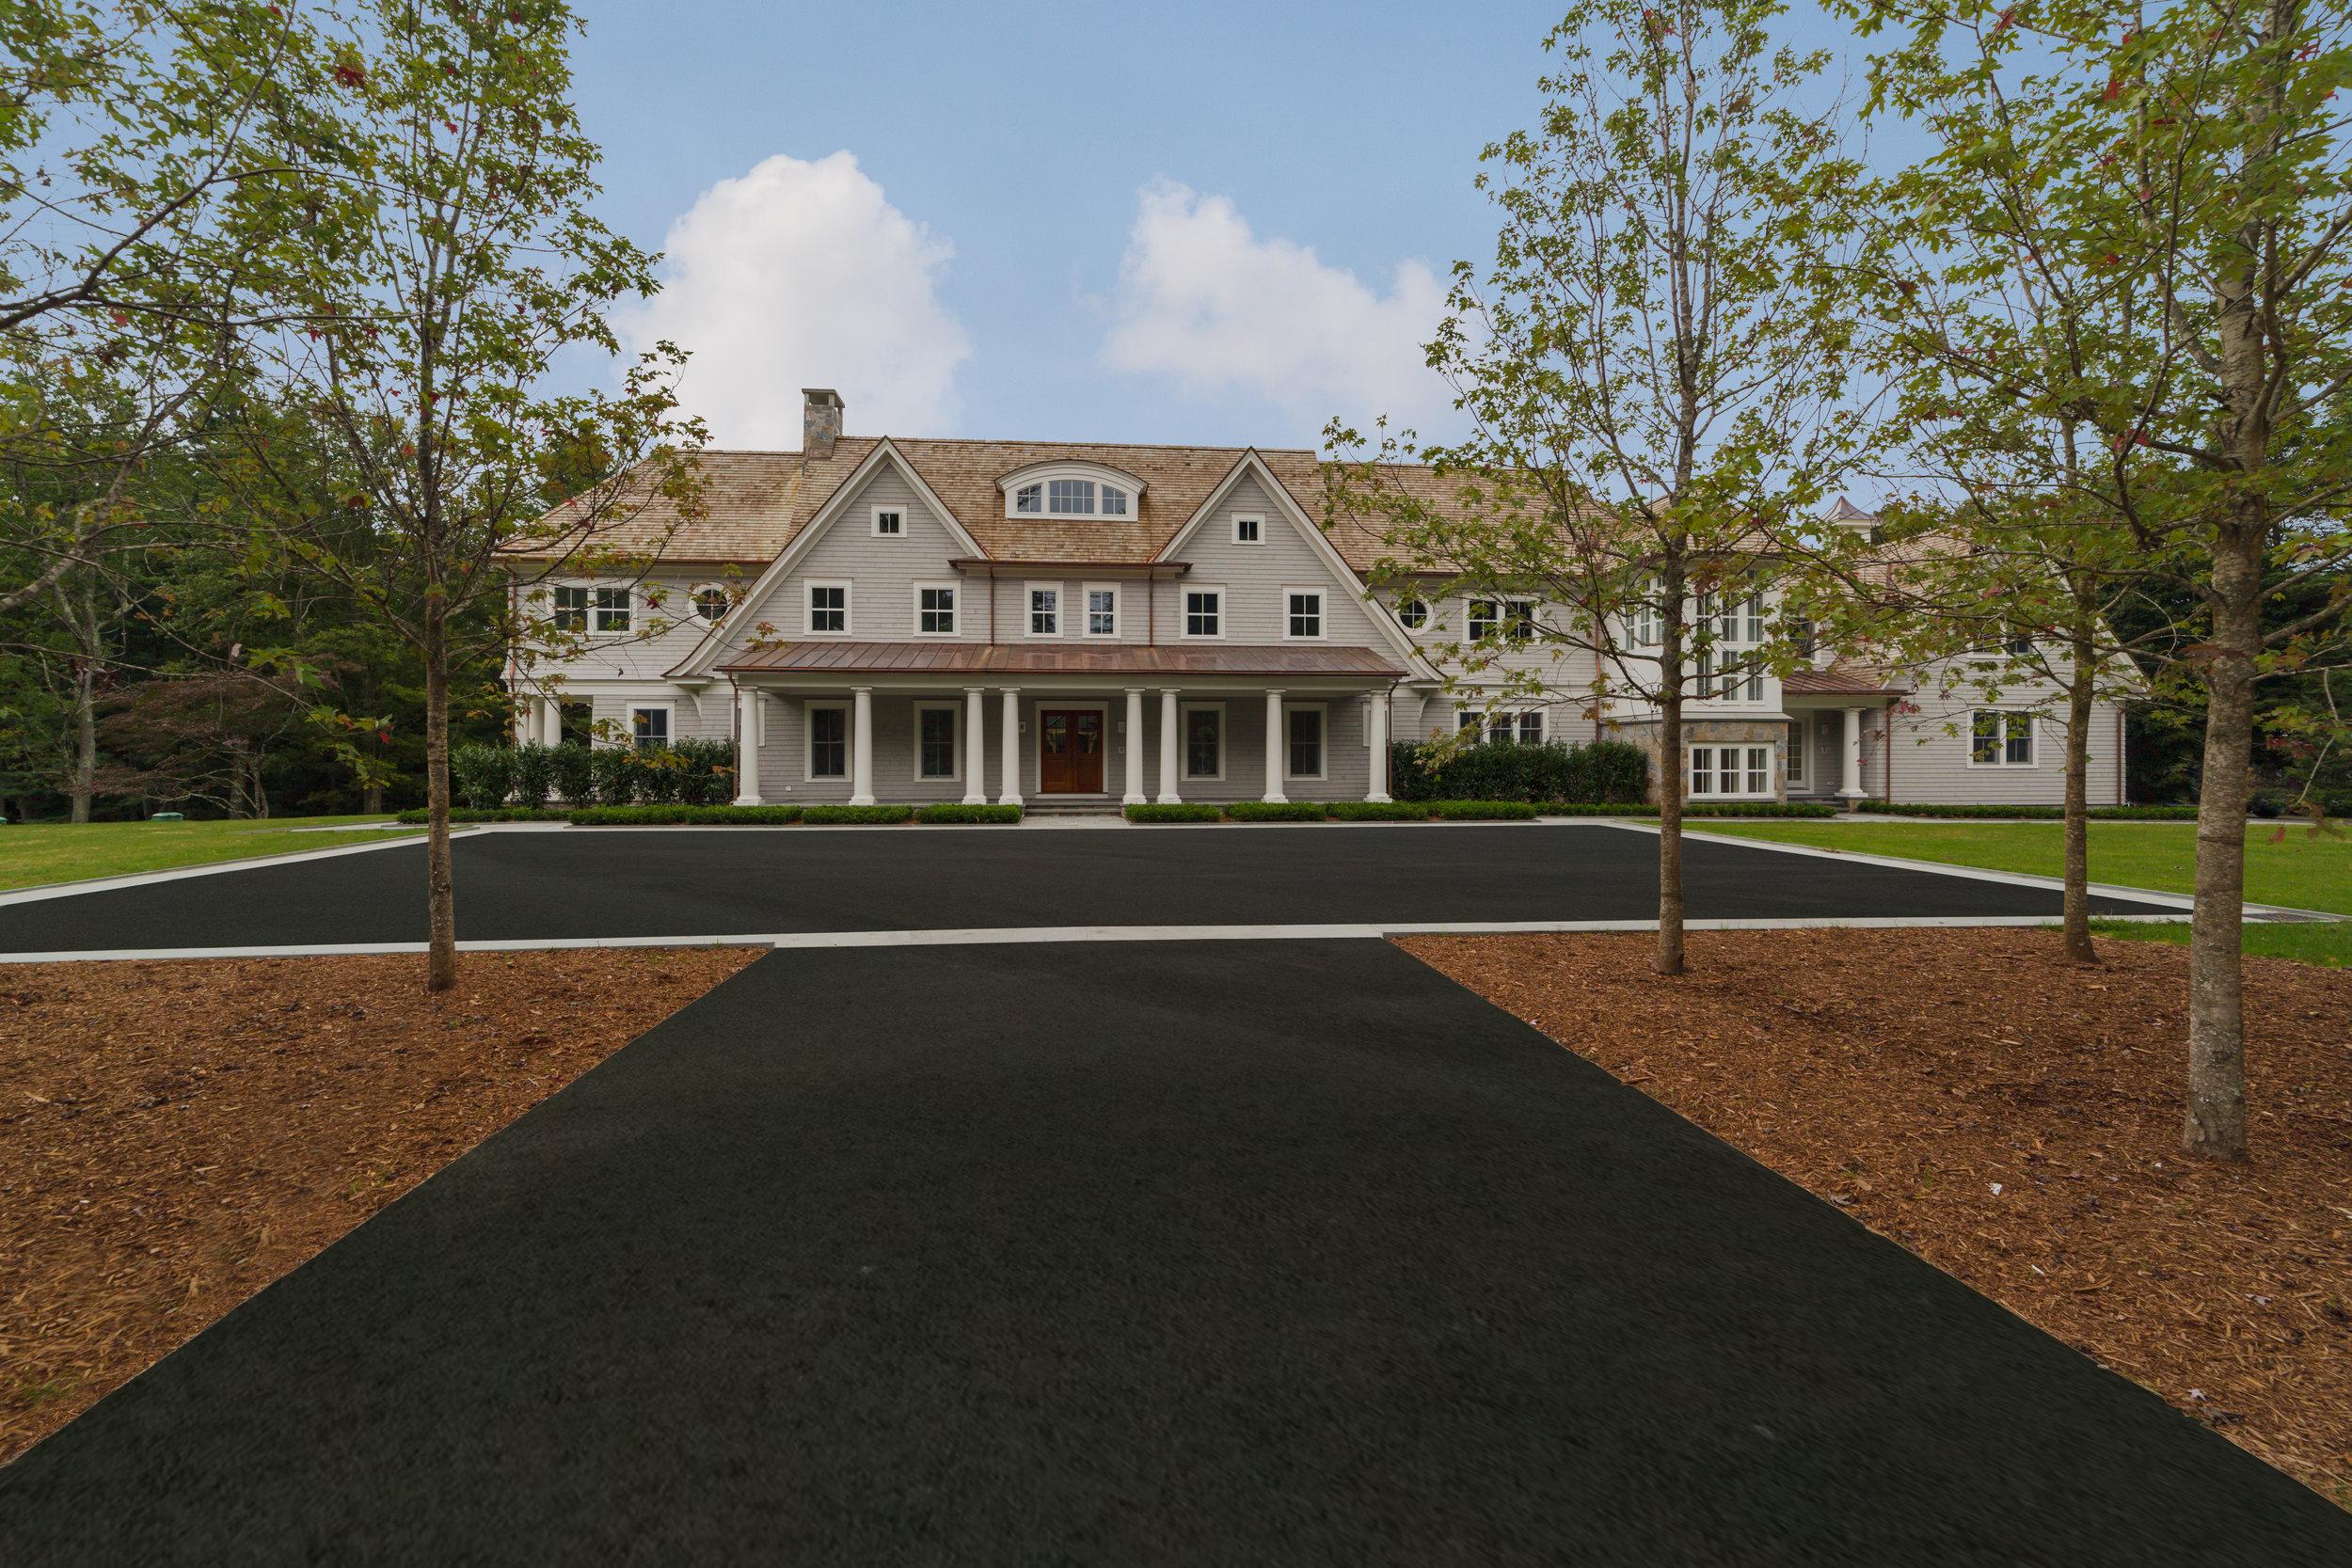 House - Front.jpg